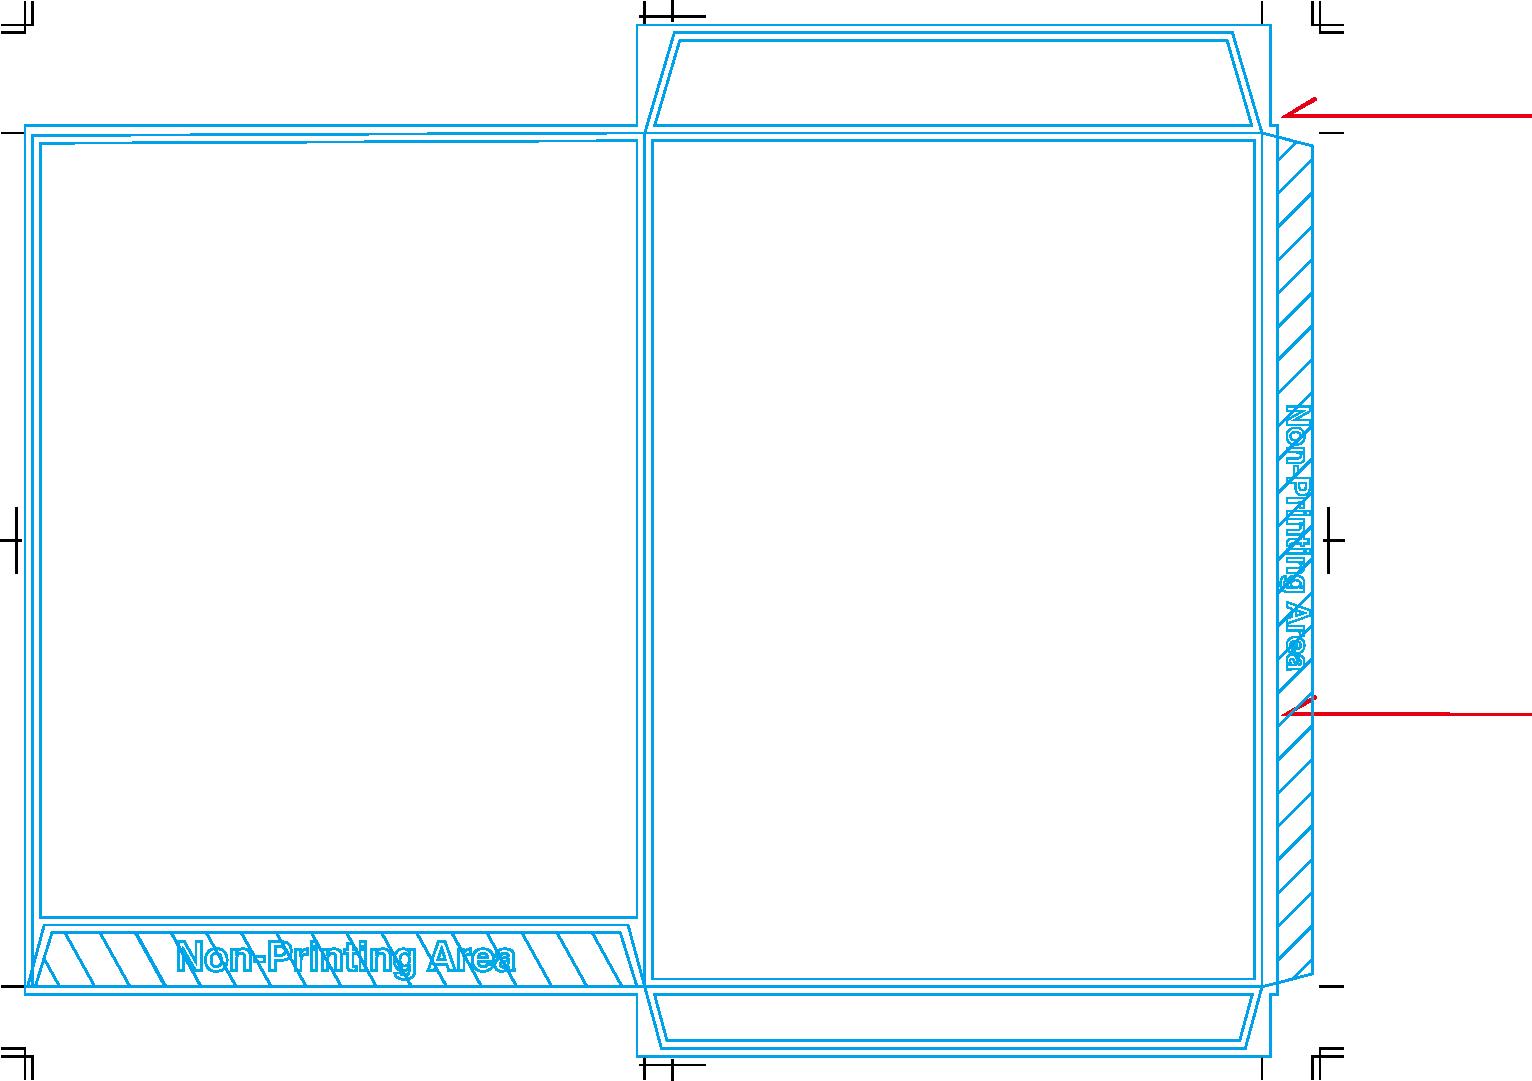 Custom Envelopes - Understanding the envelope templates 01 Image